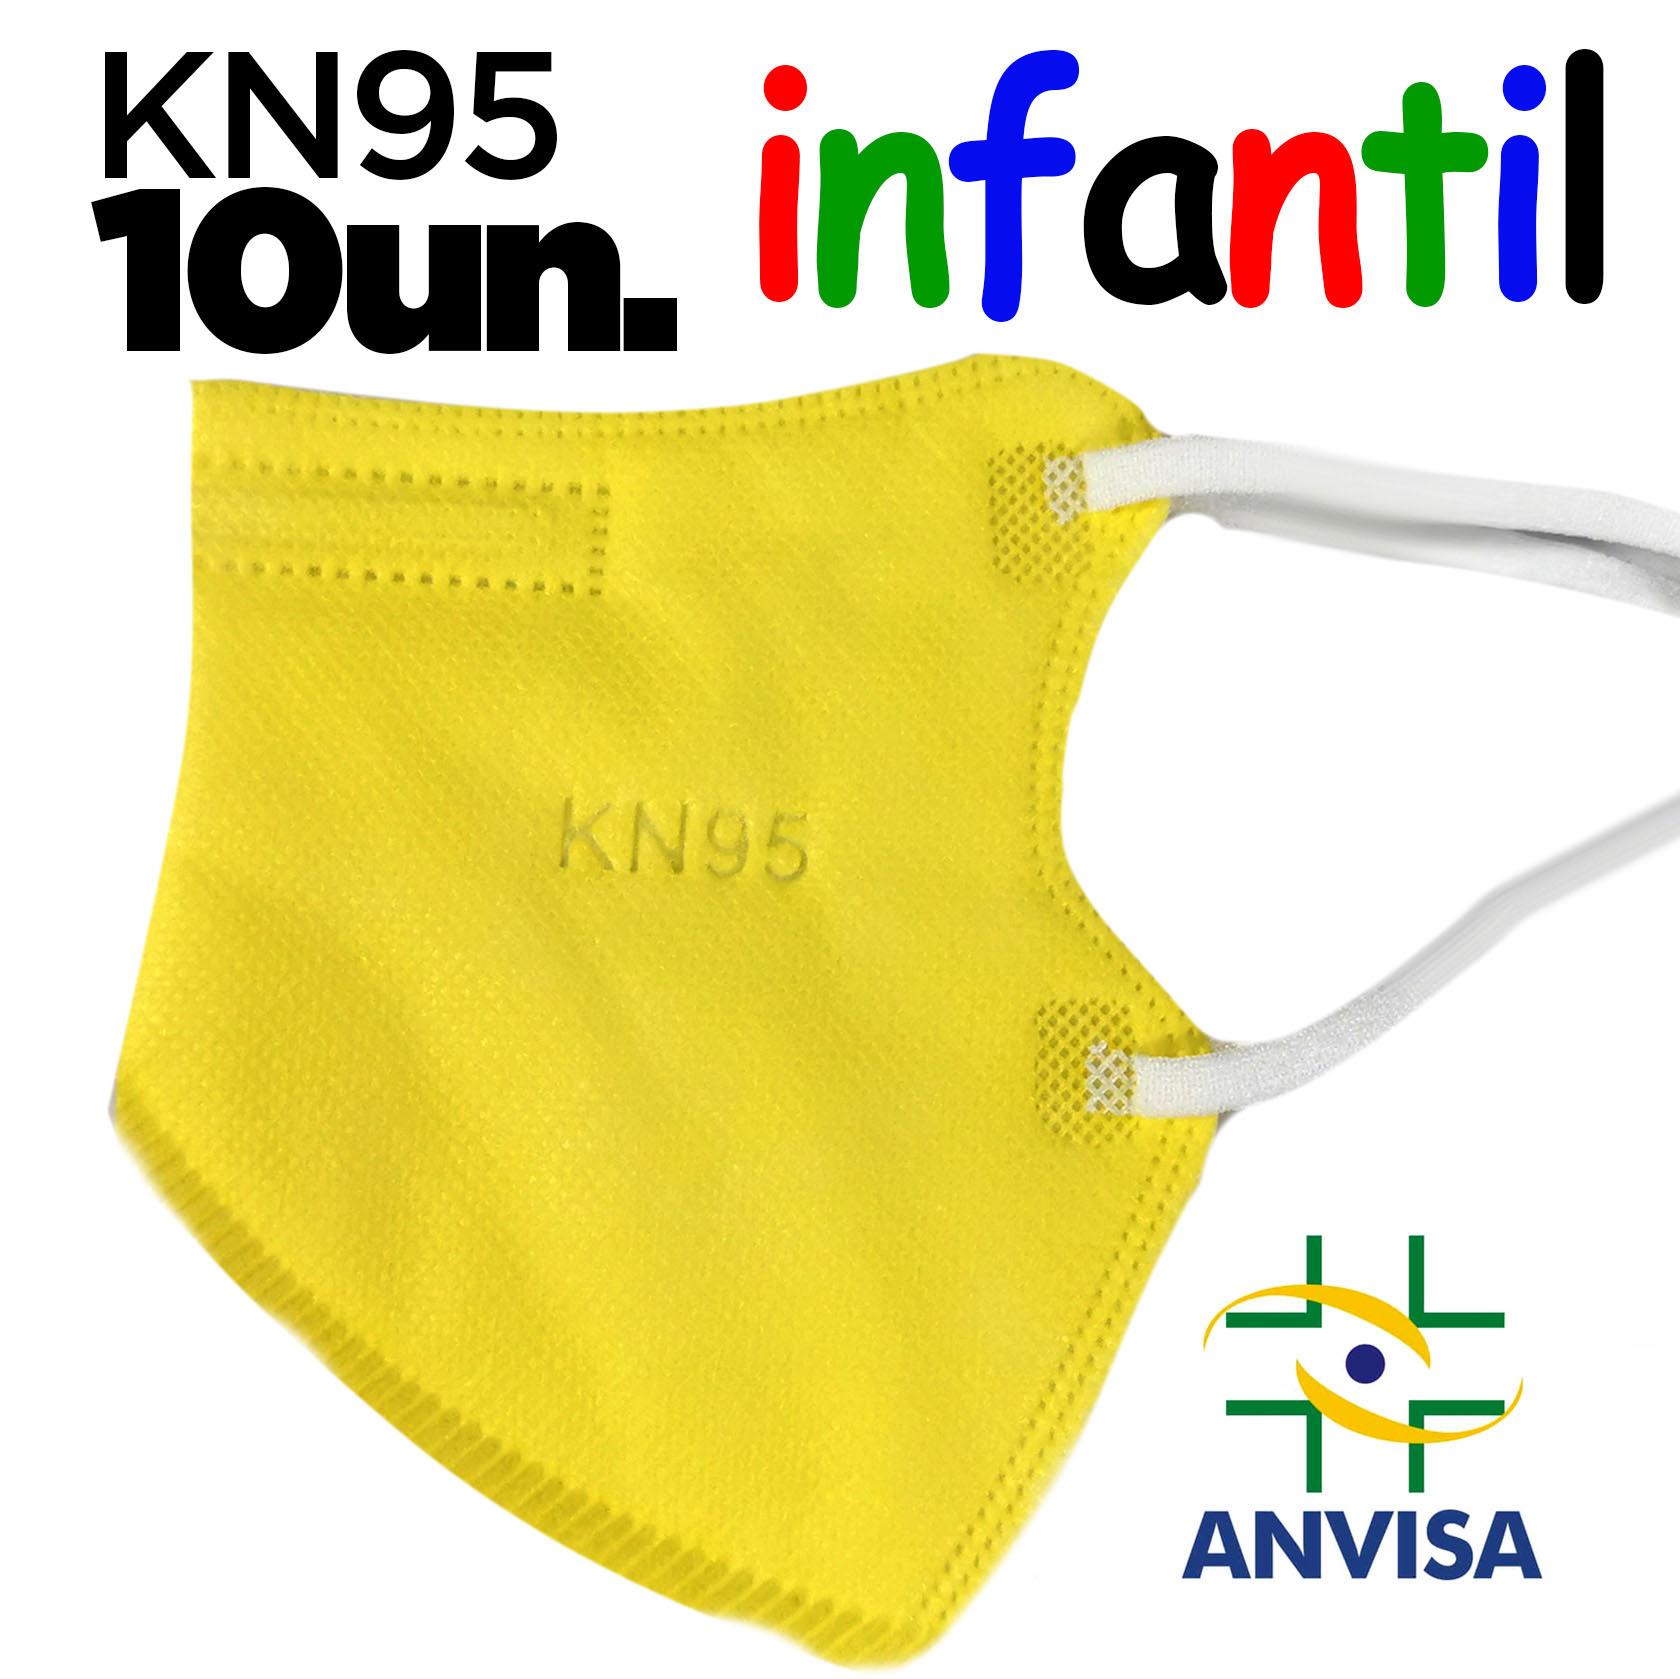 Máscara KN95 / PFF2 / N95  infantil amarela colorida - caixa 10 unidades 5 camadas meltblow BFE 98% + feltro de coton + tnt spunbond hospitalar hipoalergenico